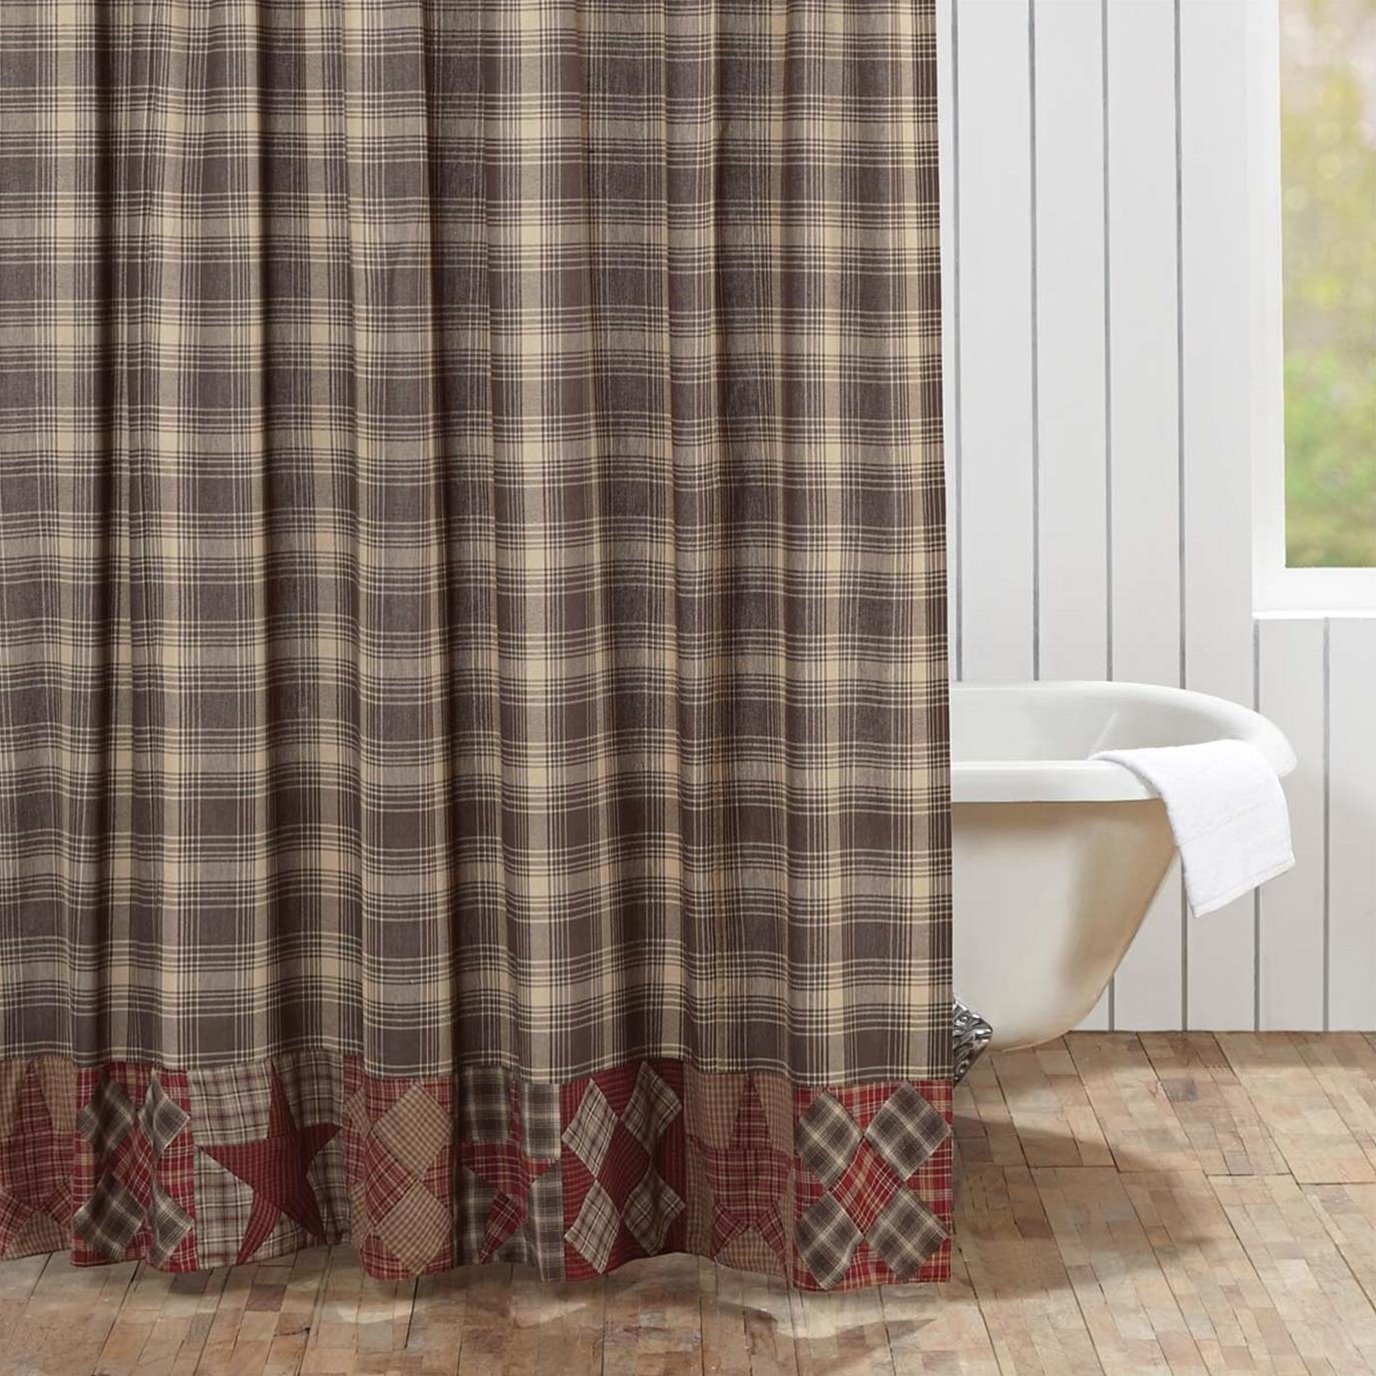 Dawson Star Patchwork Shower Curtain 72x72